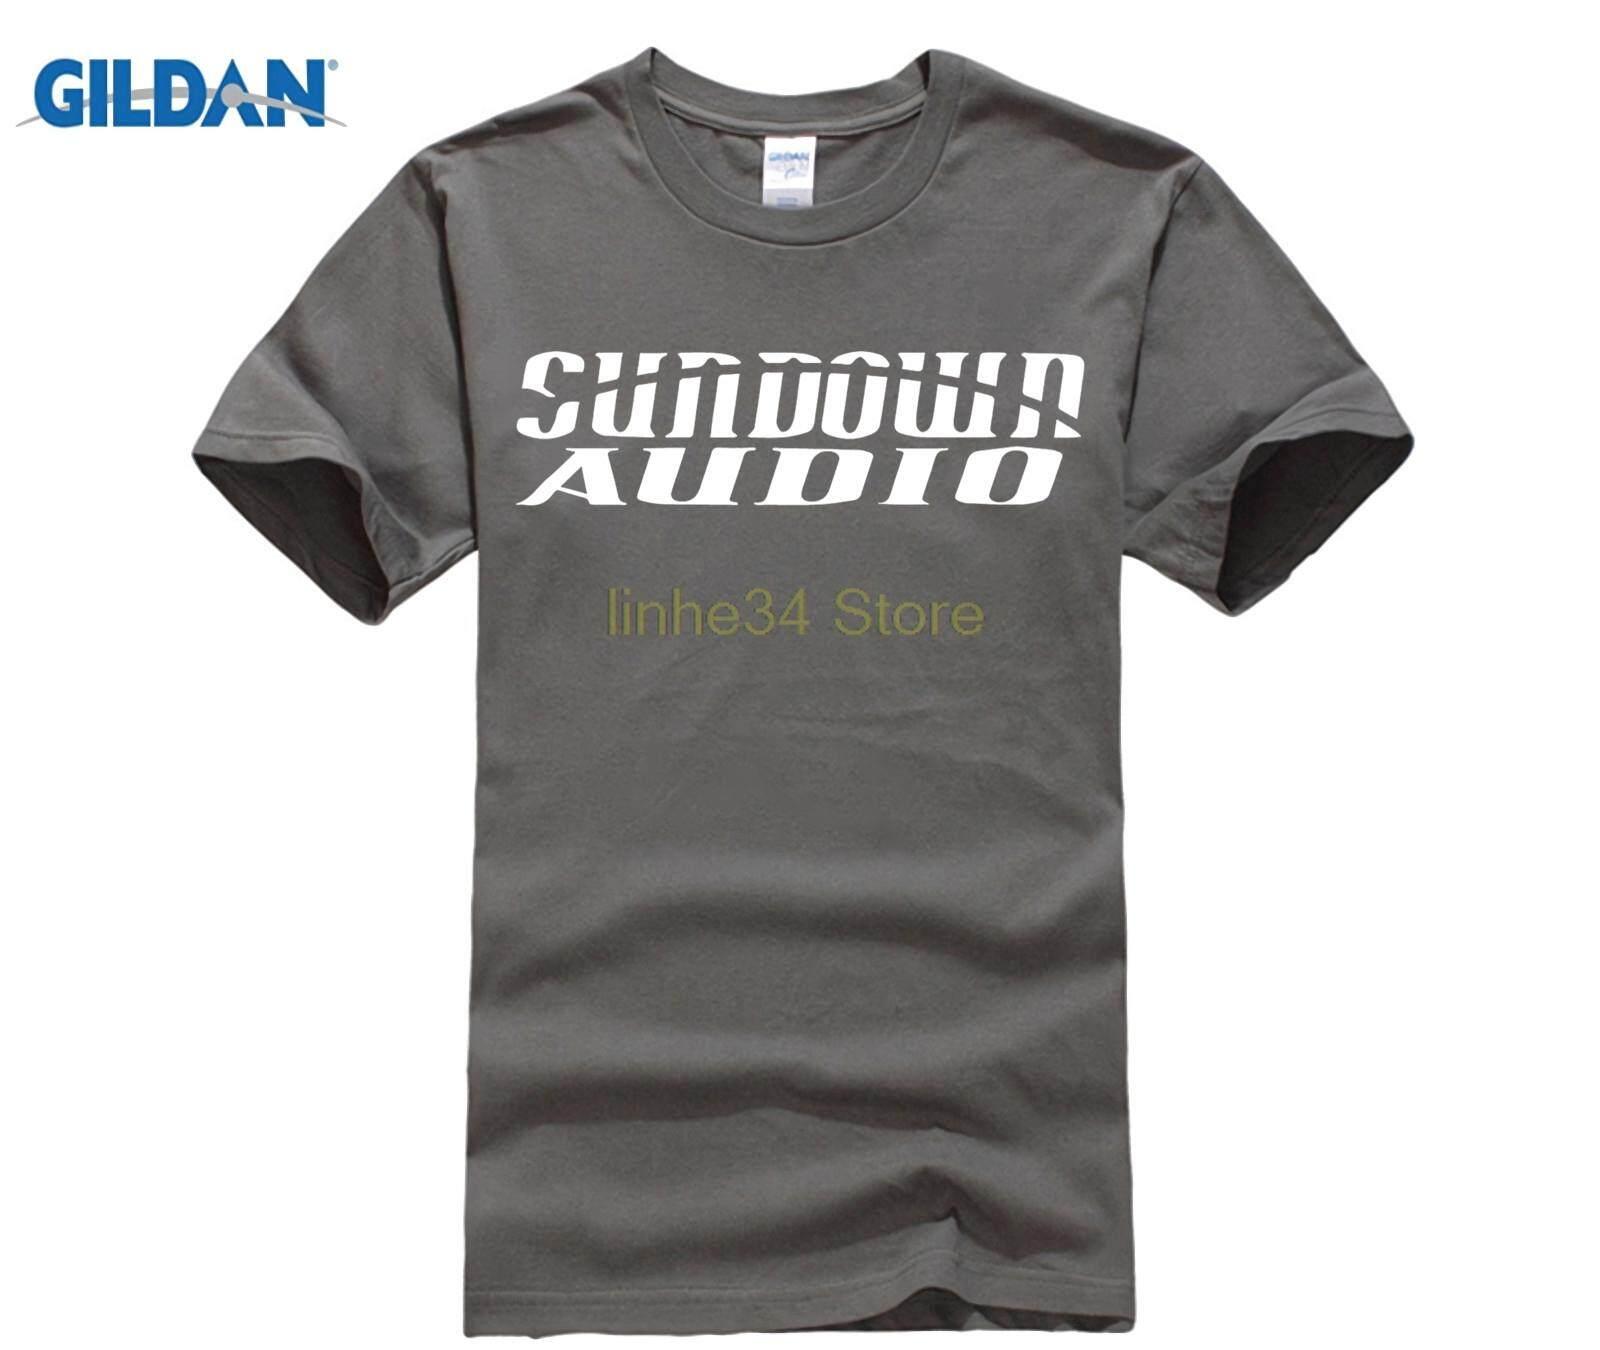 Diy GILDAN SUNDOWN AUDIO T Shirts Men Hip Hop Loud Music Cotton T-shirt Boy 279eb9971155